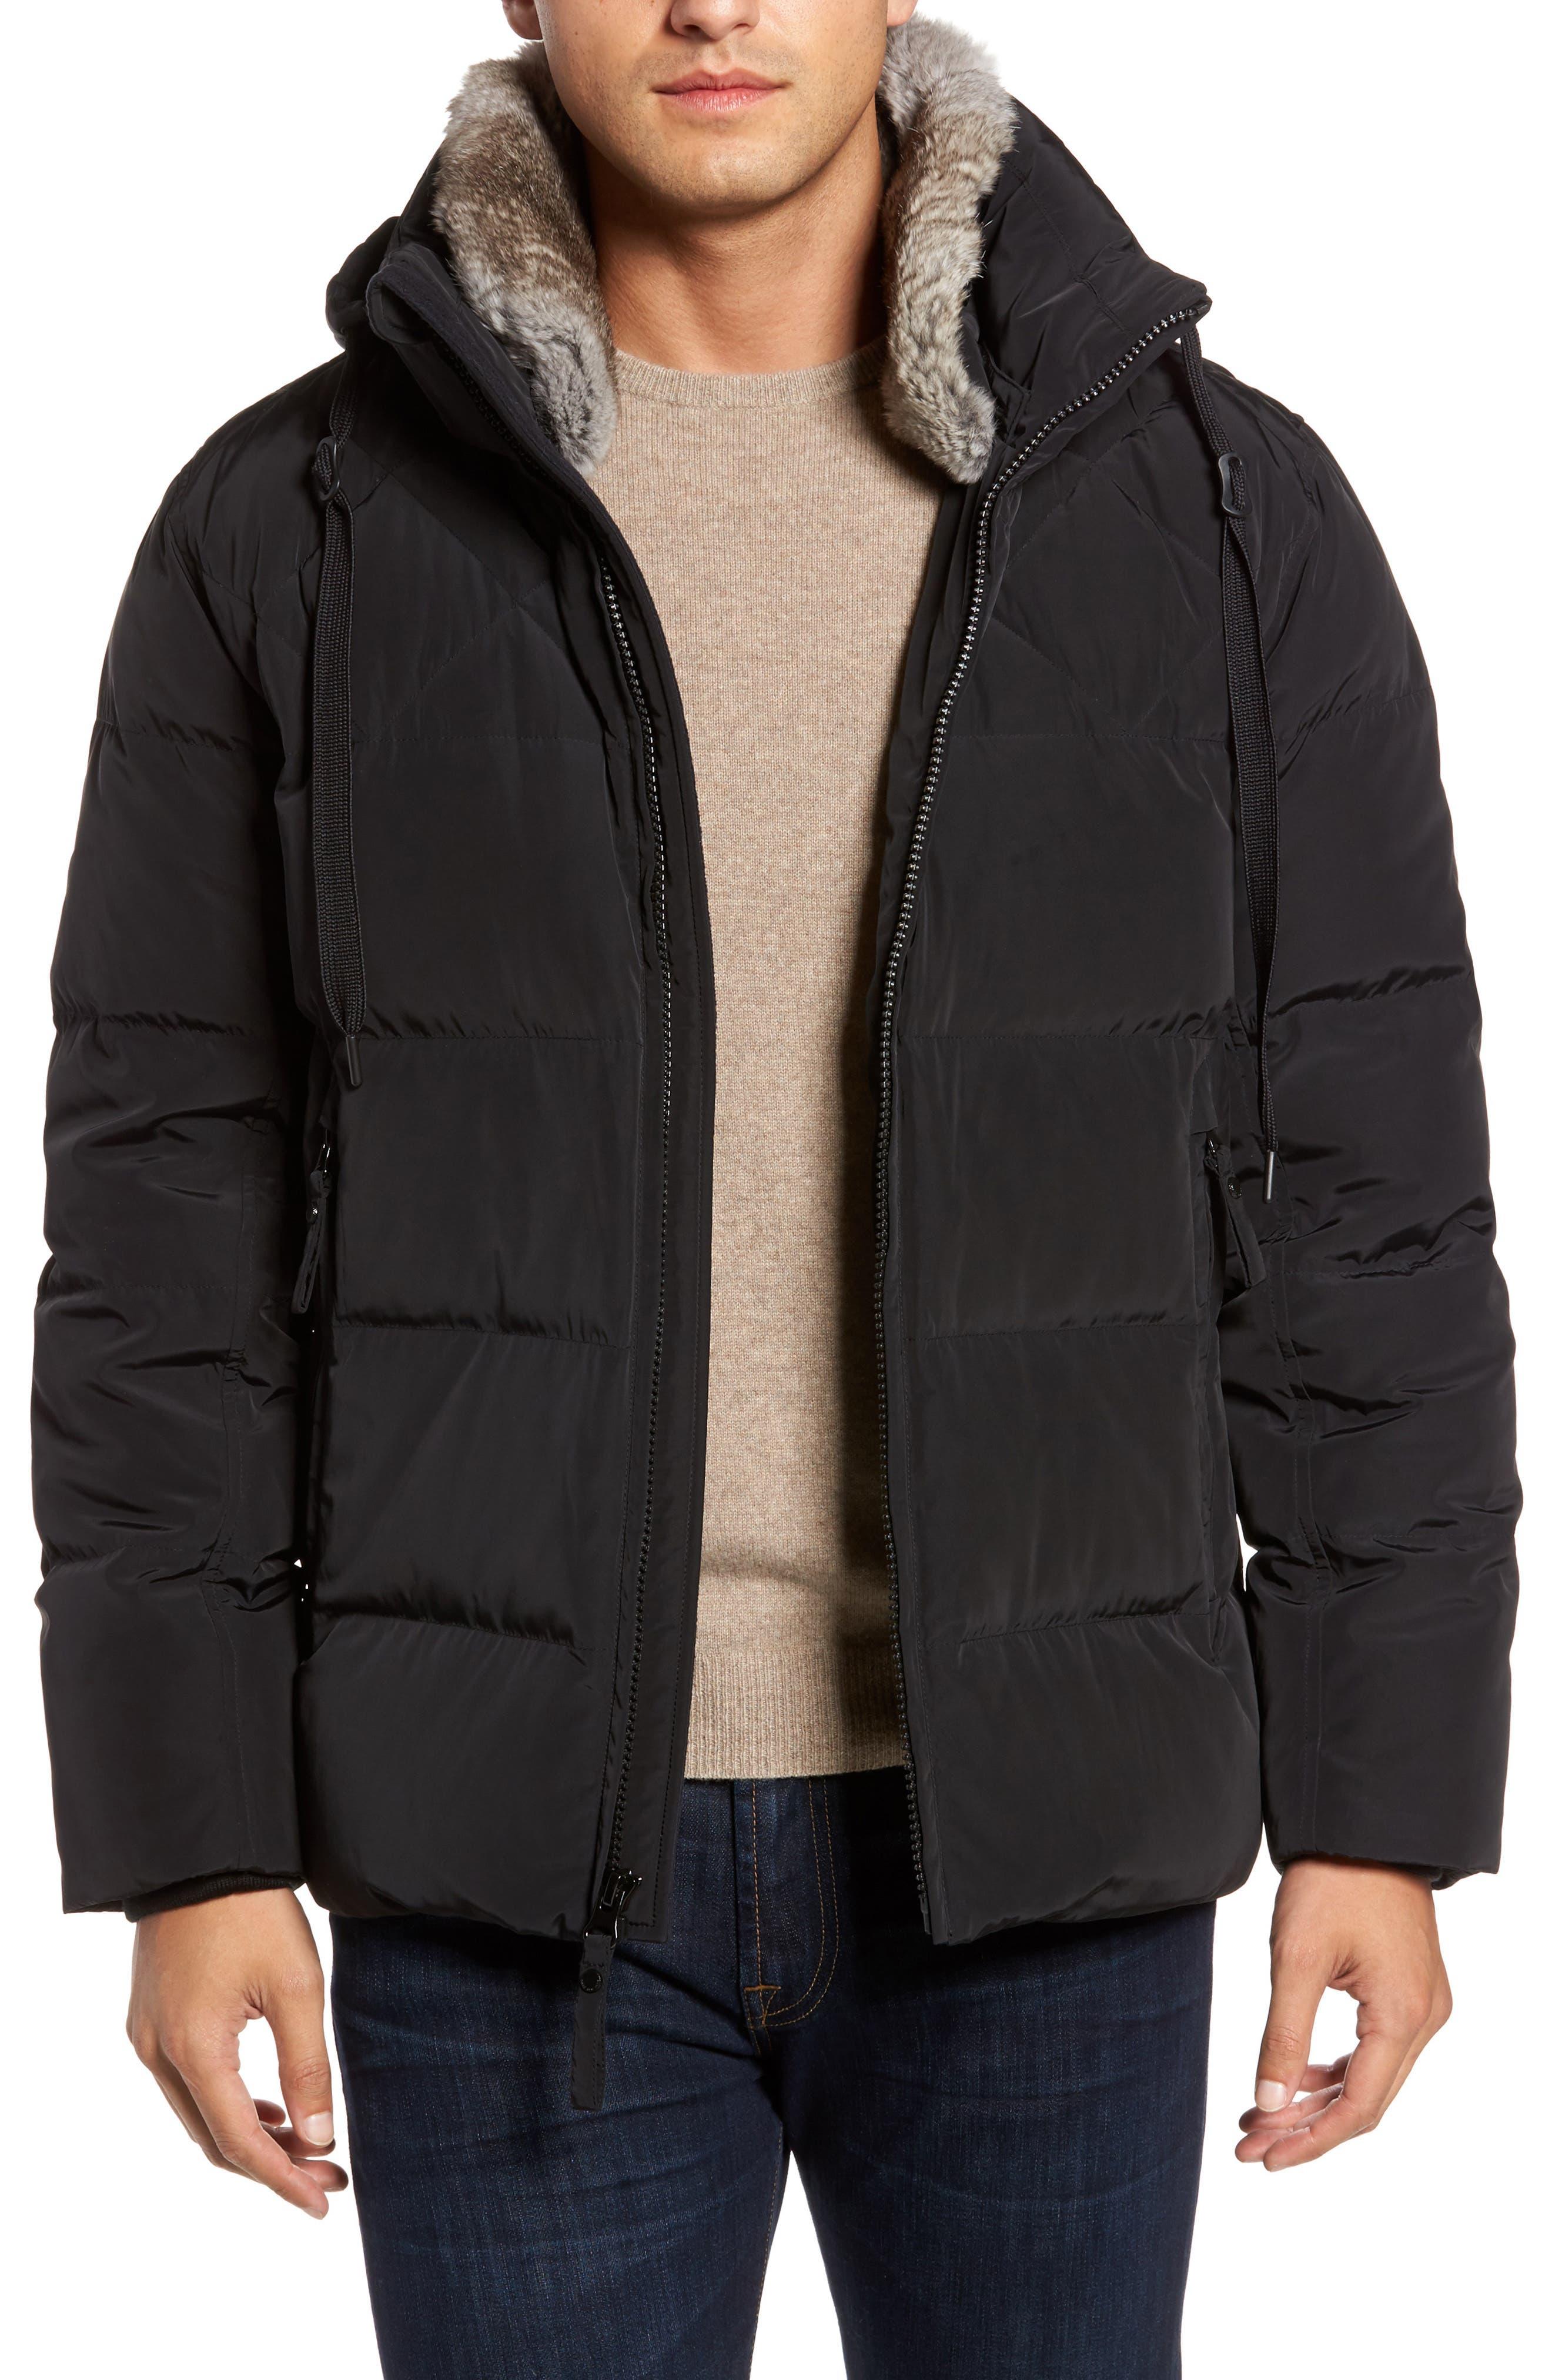 Navan Quilted Down Jacket with Genuine Rabbit Fur Trim,                         Main,                         color, Black